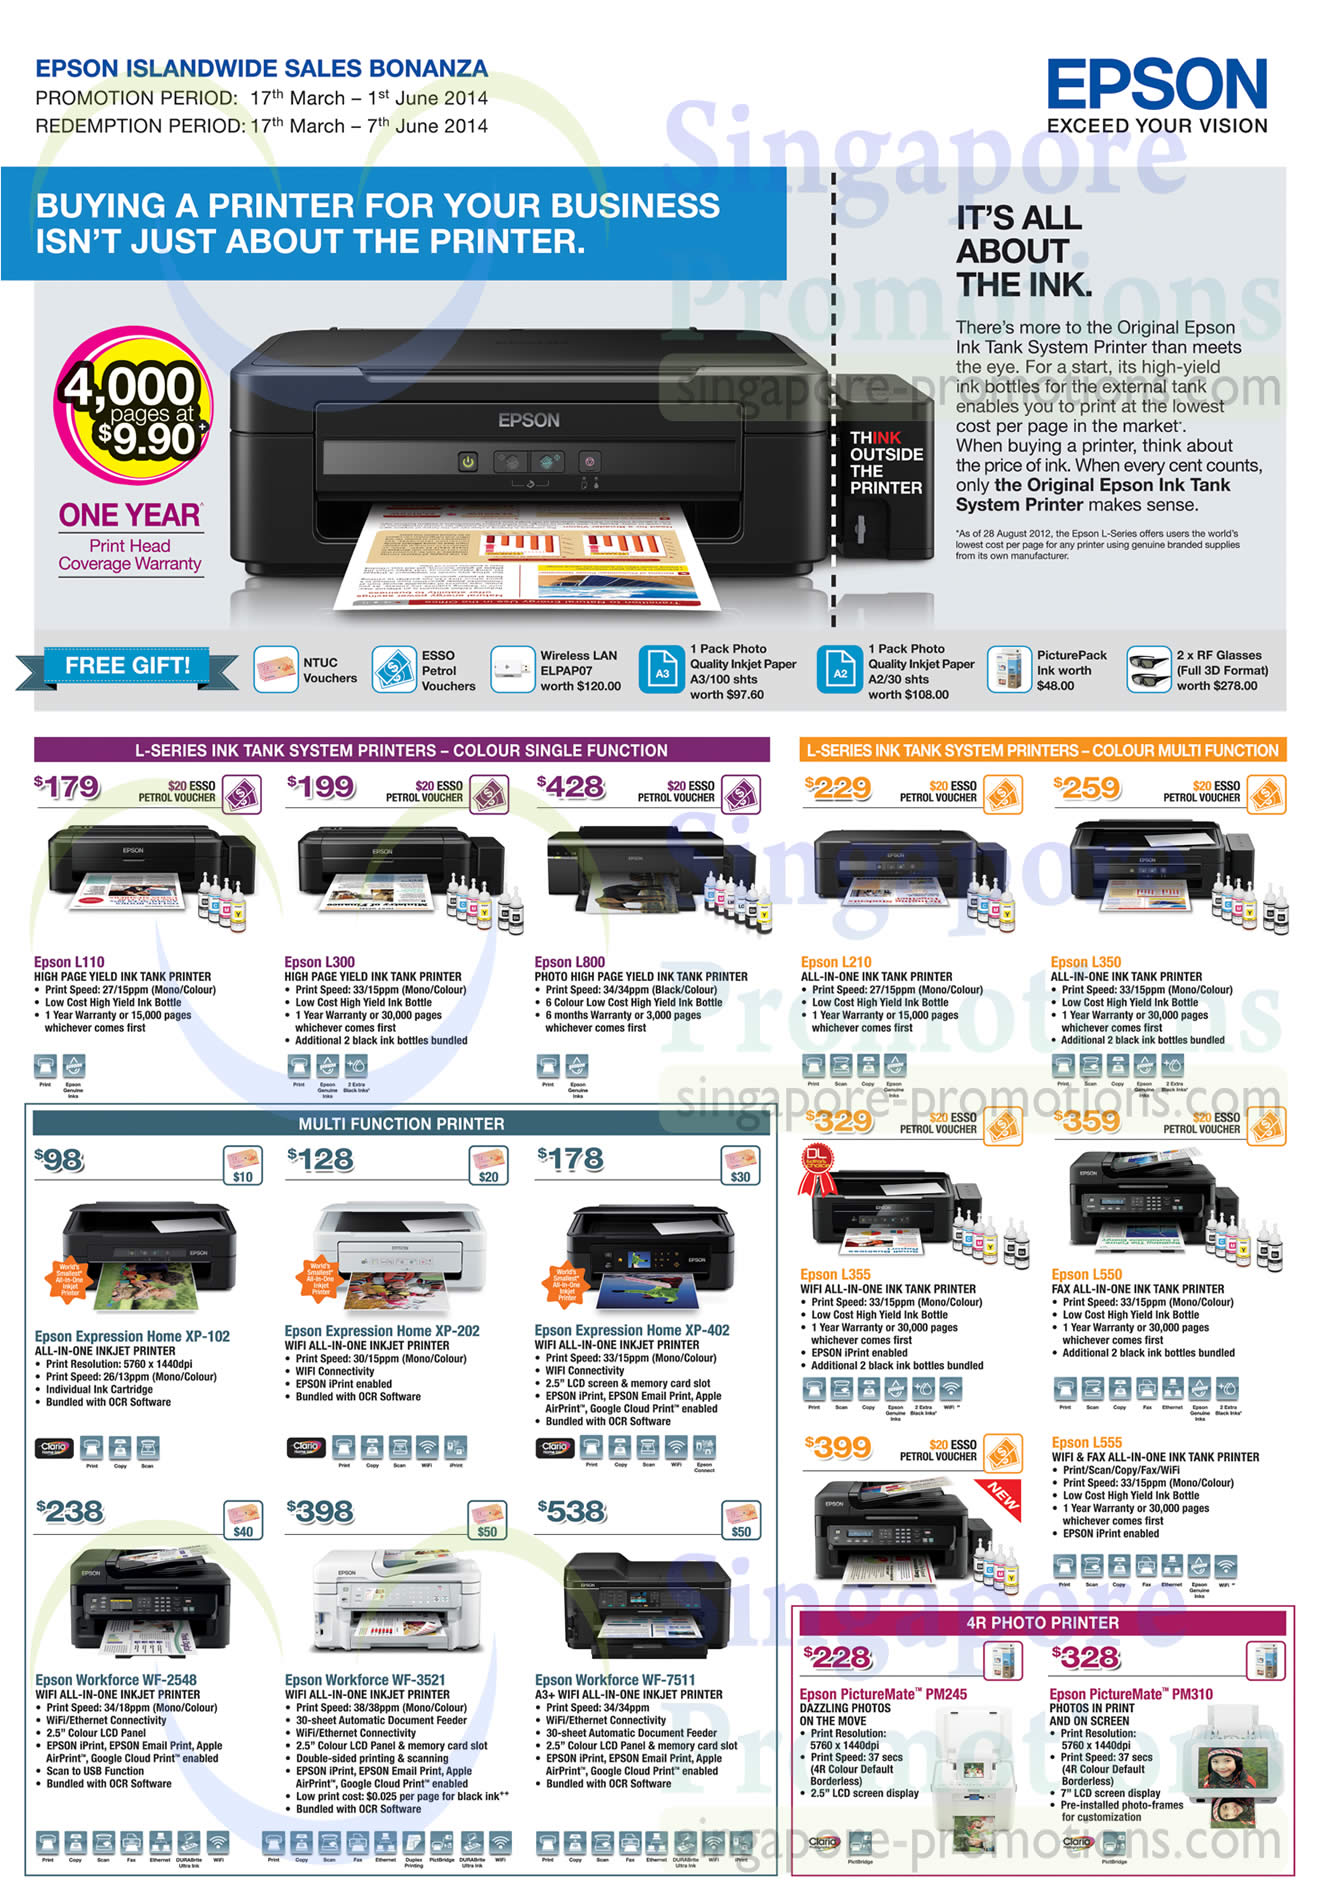 Epson L110 Printer, Epson L300 Printer, Epson L800 Printer, Epson L210 Printer, Epson L350 Printer, Epson L355 Printer, Epson L550 Printer, Epson L555 Printer, Epson XP-102 Printer, Epson XP-202 Printer, Epson XP-402 Printer, Epson WF-7511 Printer, Epson WF-3521 Printer, Epson WF-2548 Printer, Epson PM245 Printer, Epson PM310 Printer